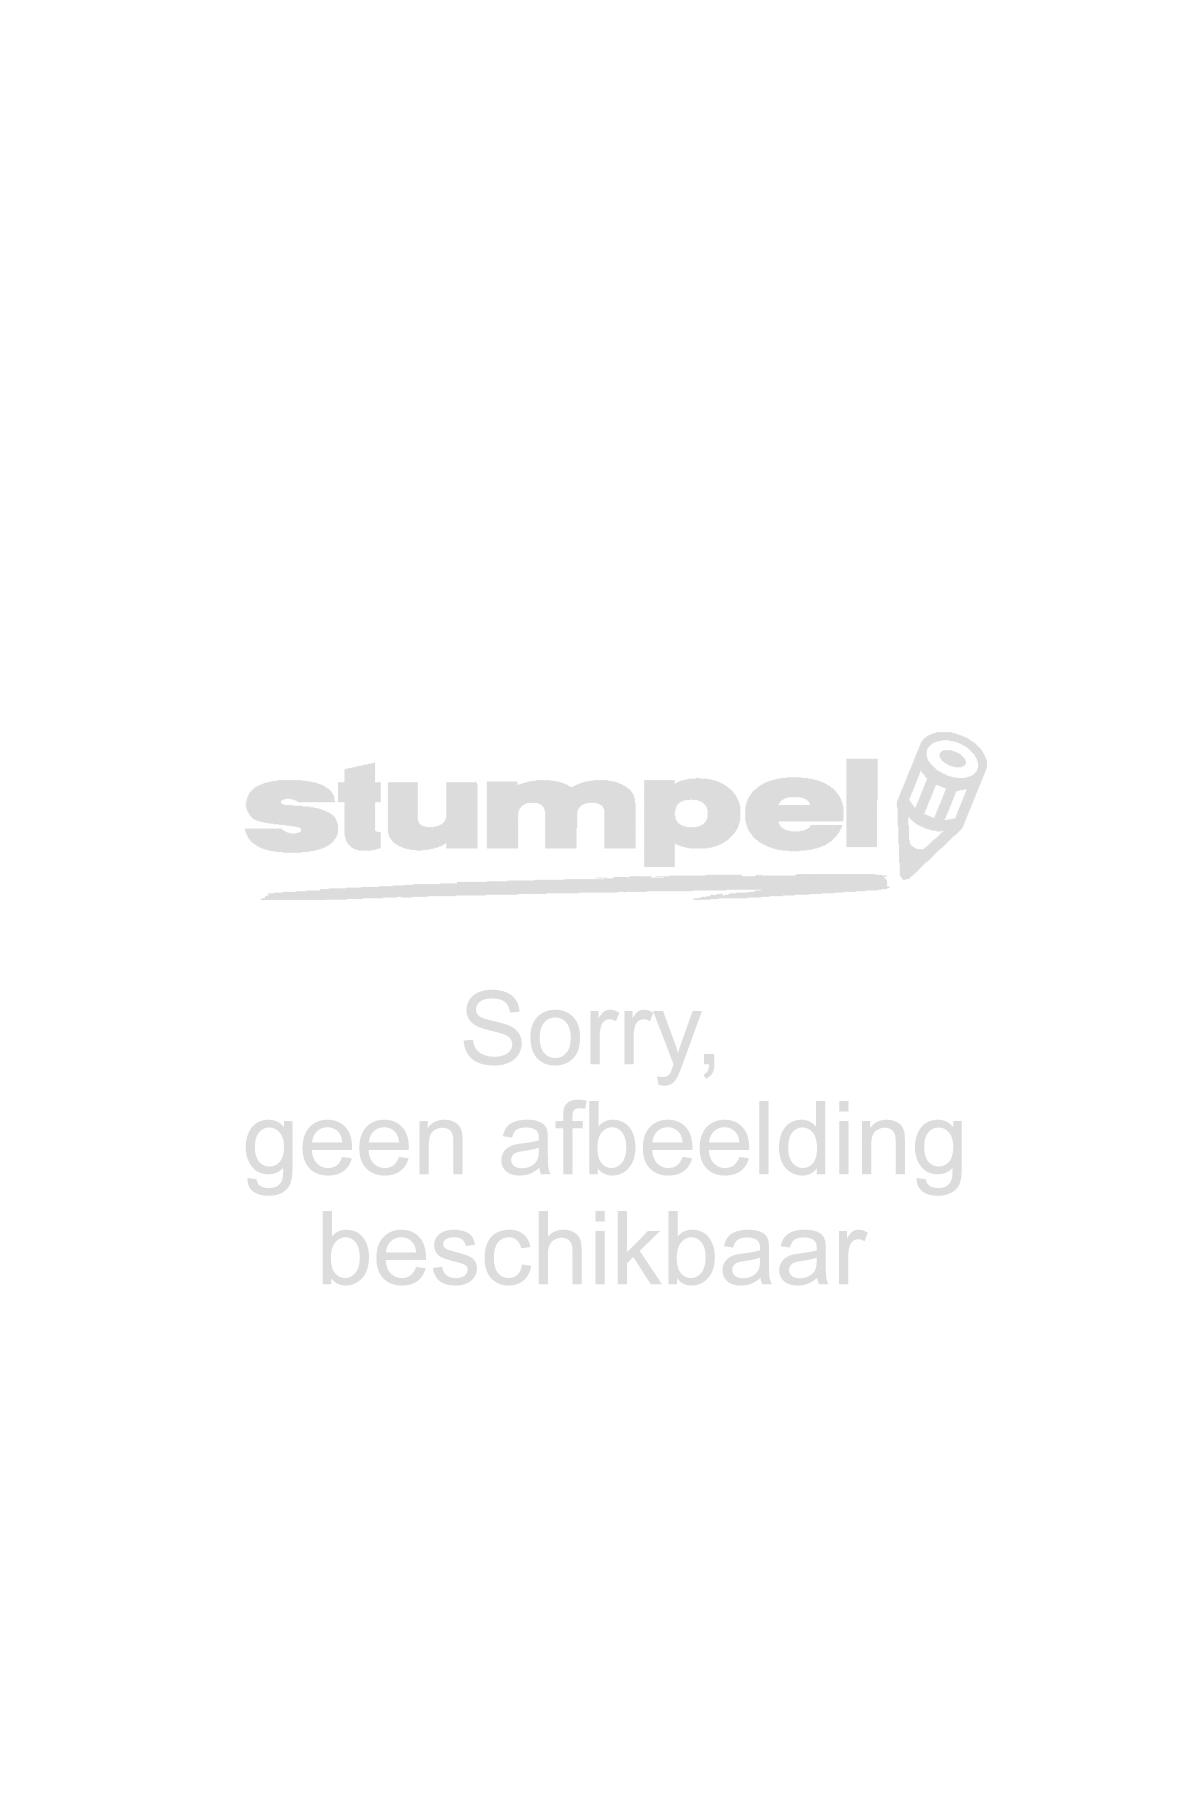 dummyboek-a4-hk-blanco-soho-trend-7604183-10033427